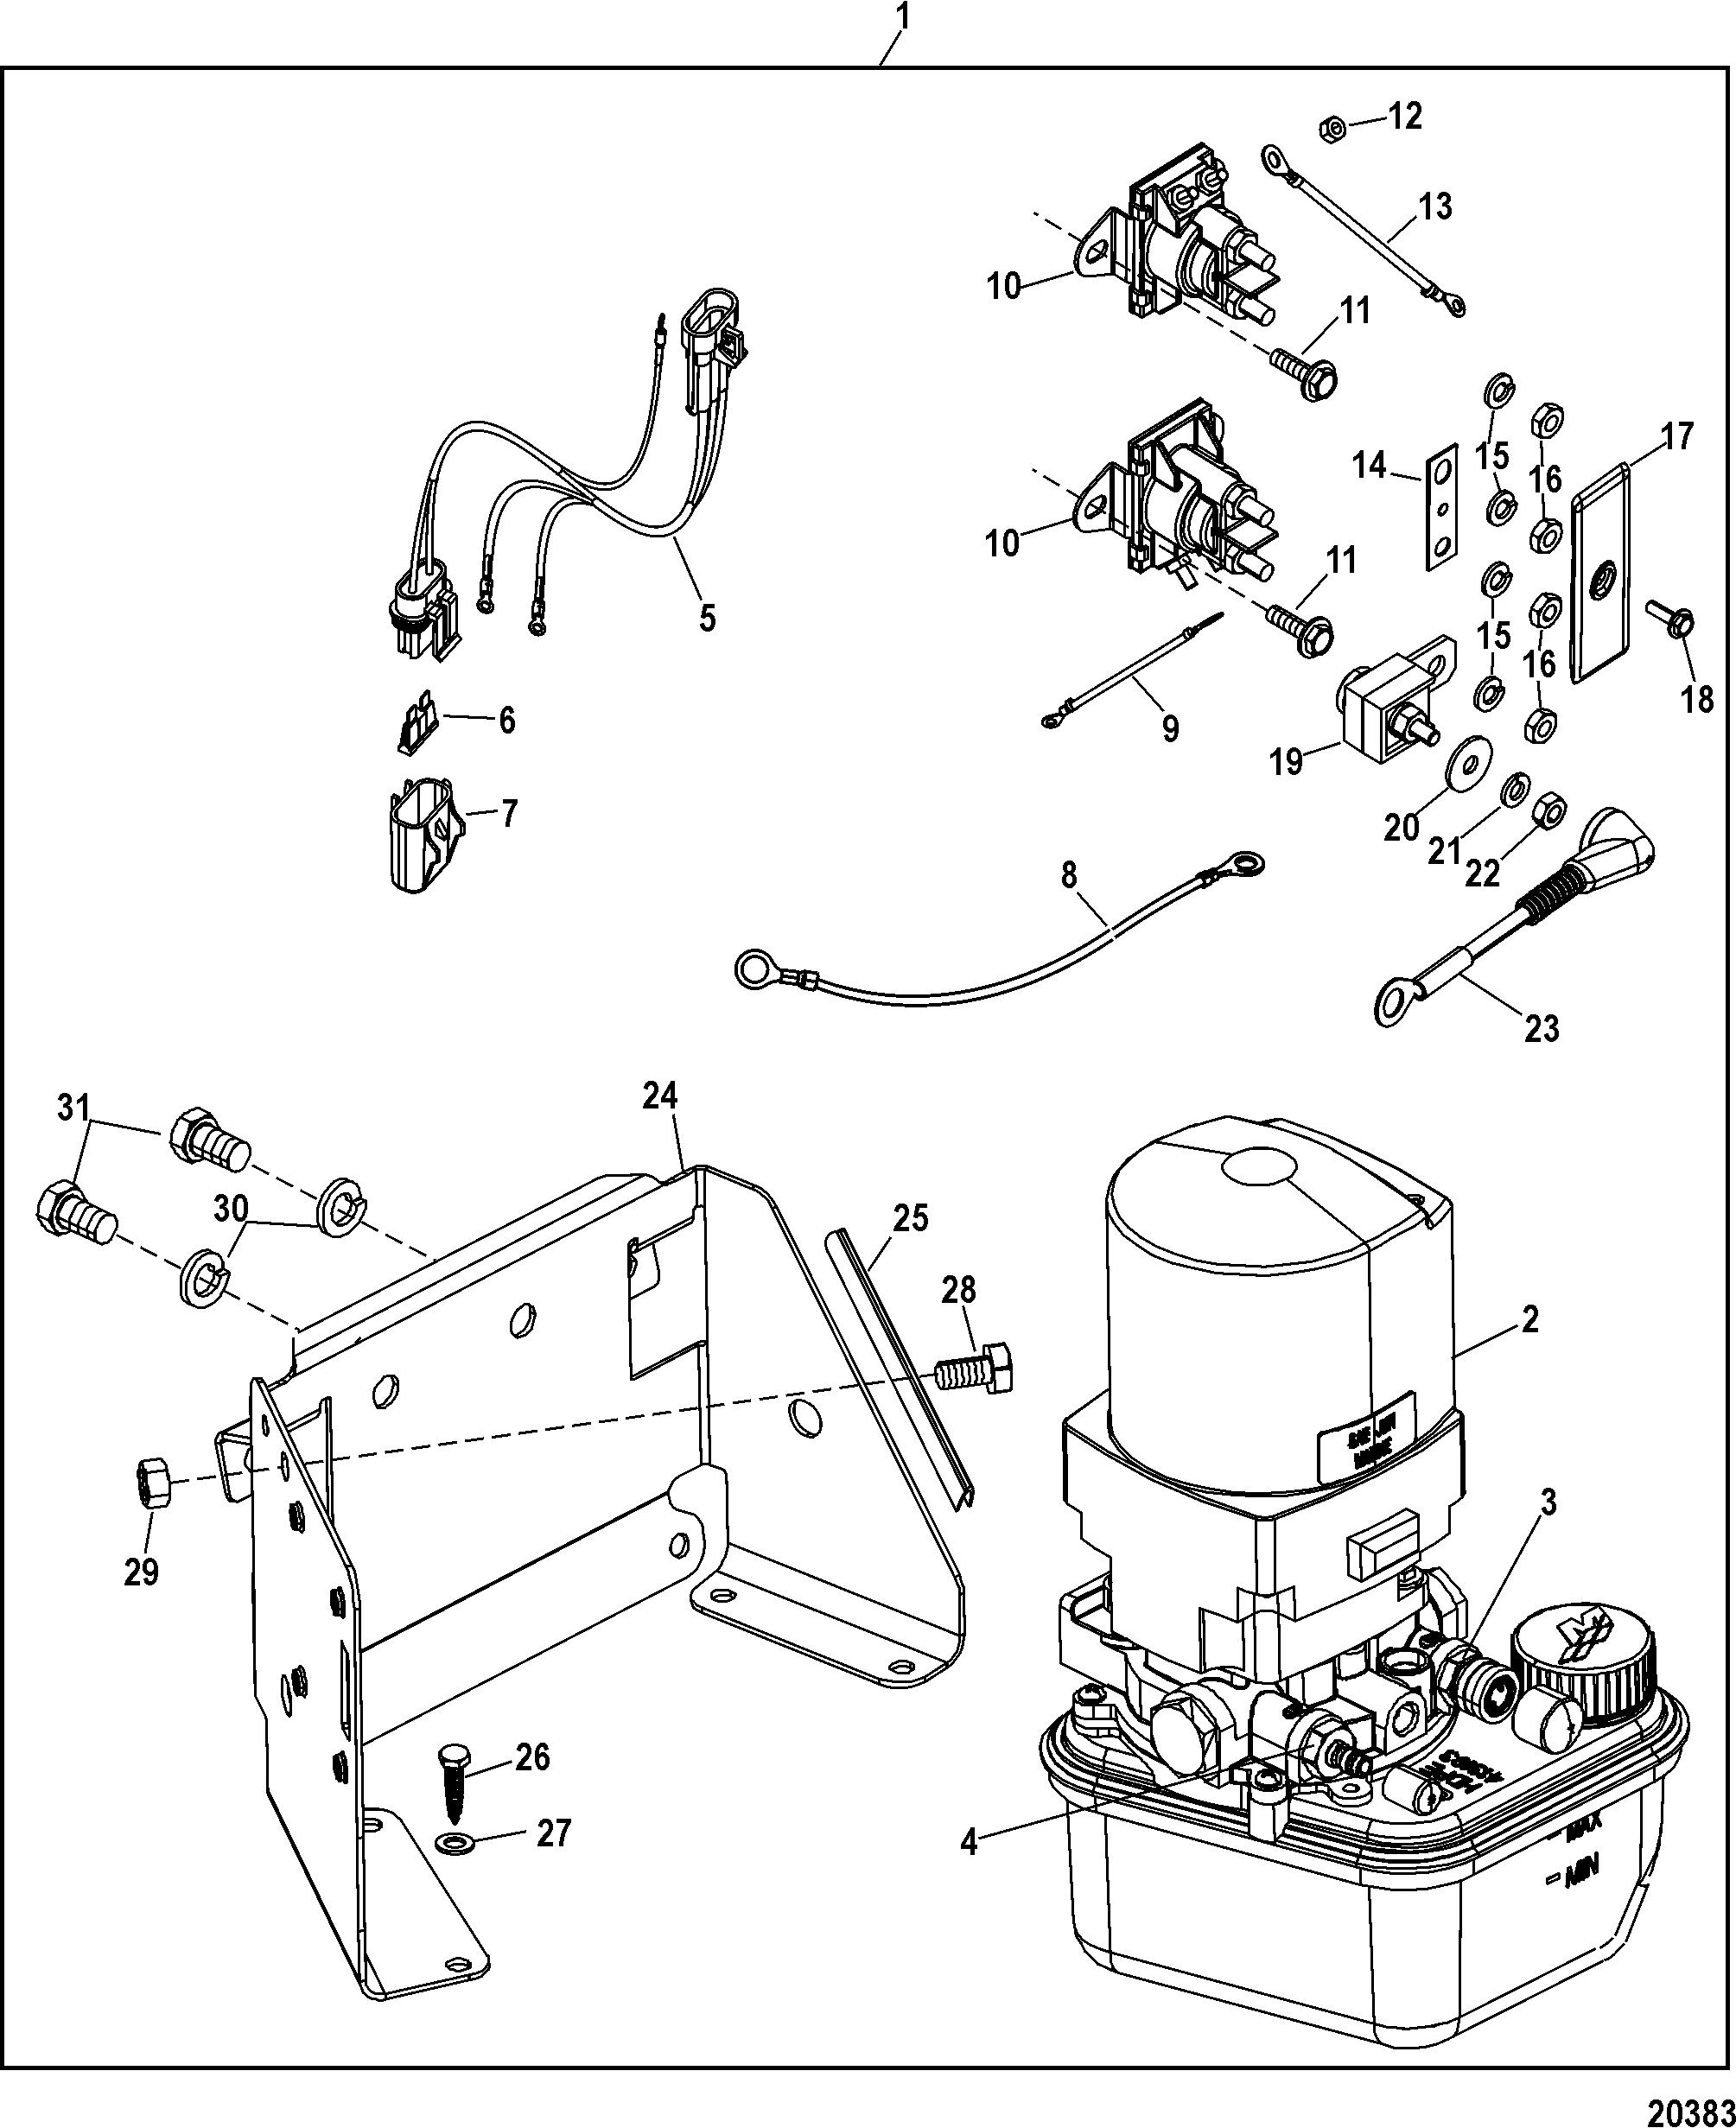 1999 Ford F350 Wiring Diagram Seoservs